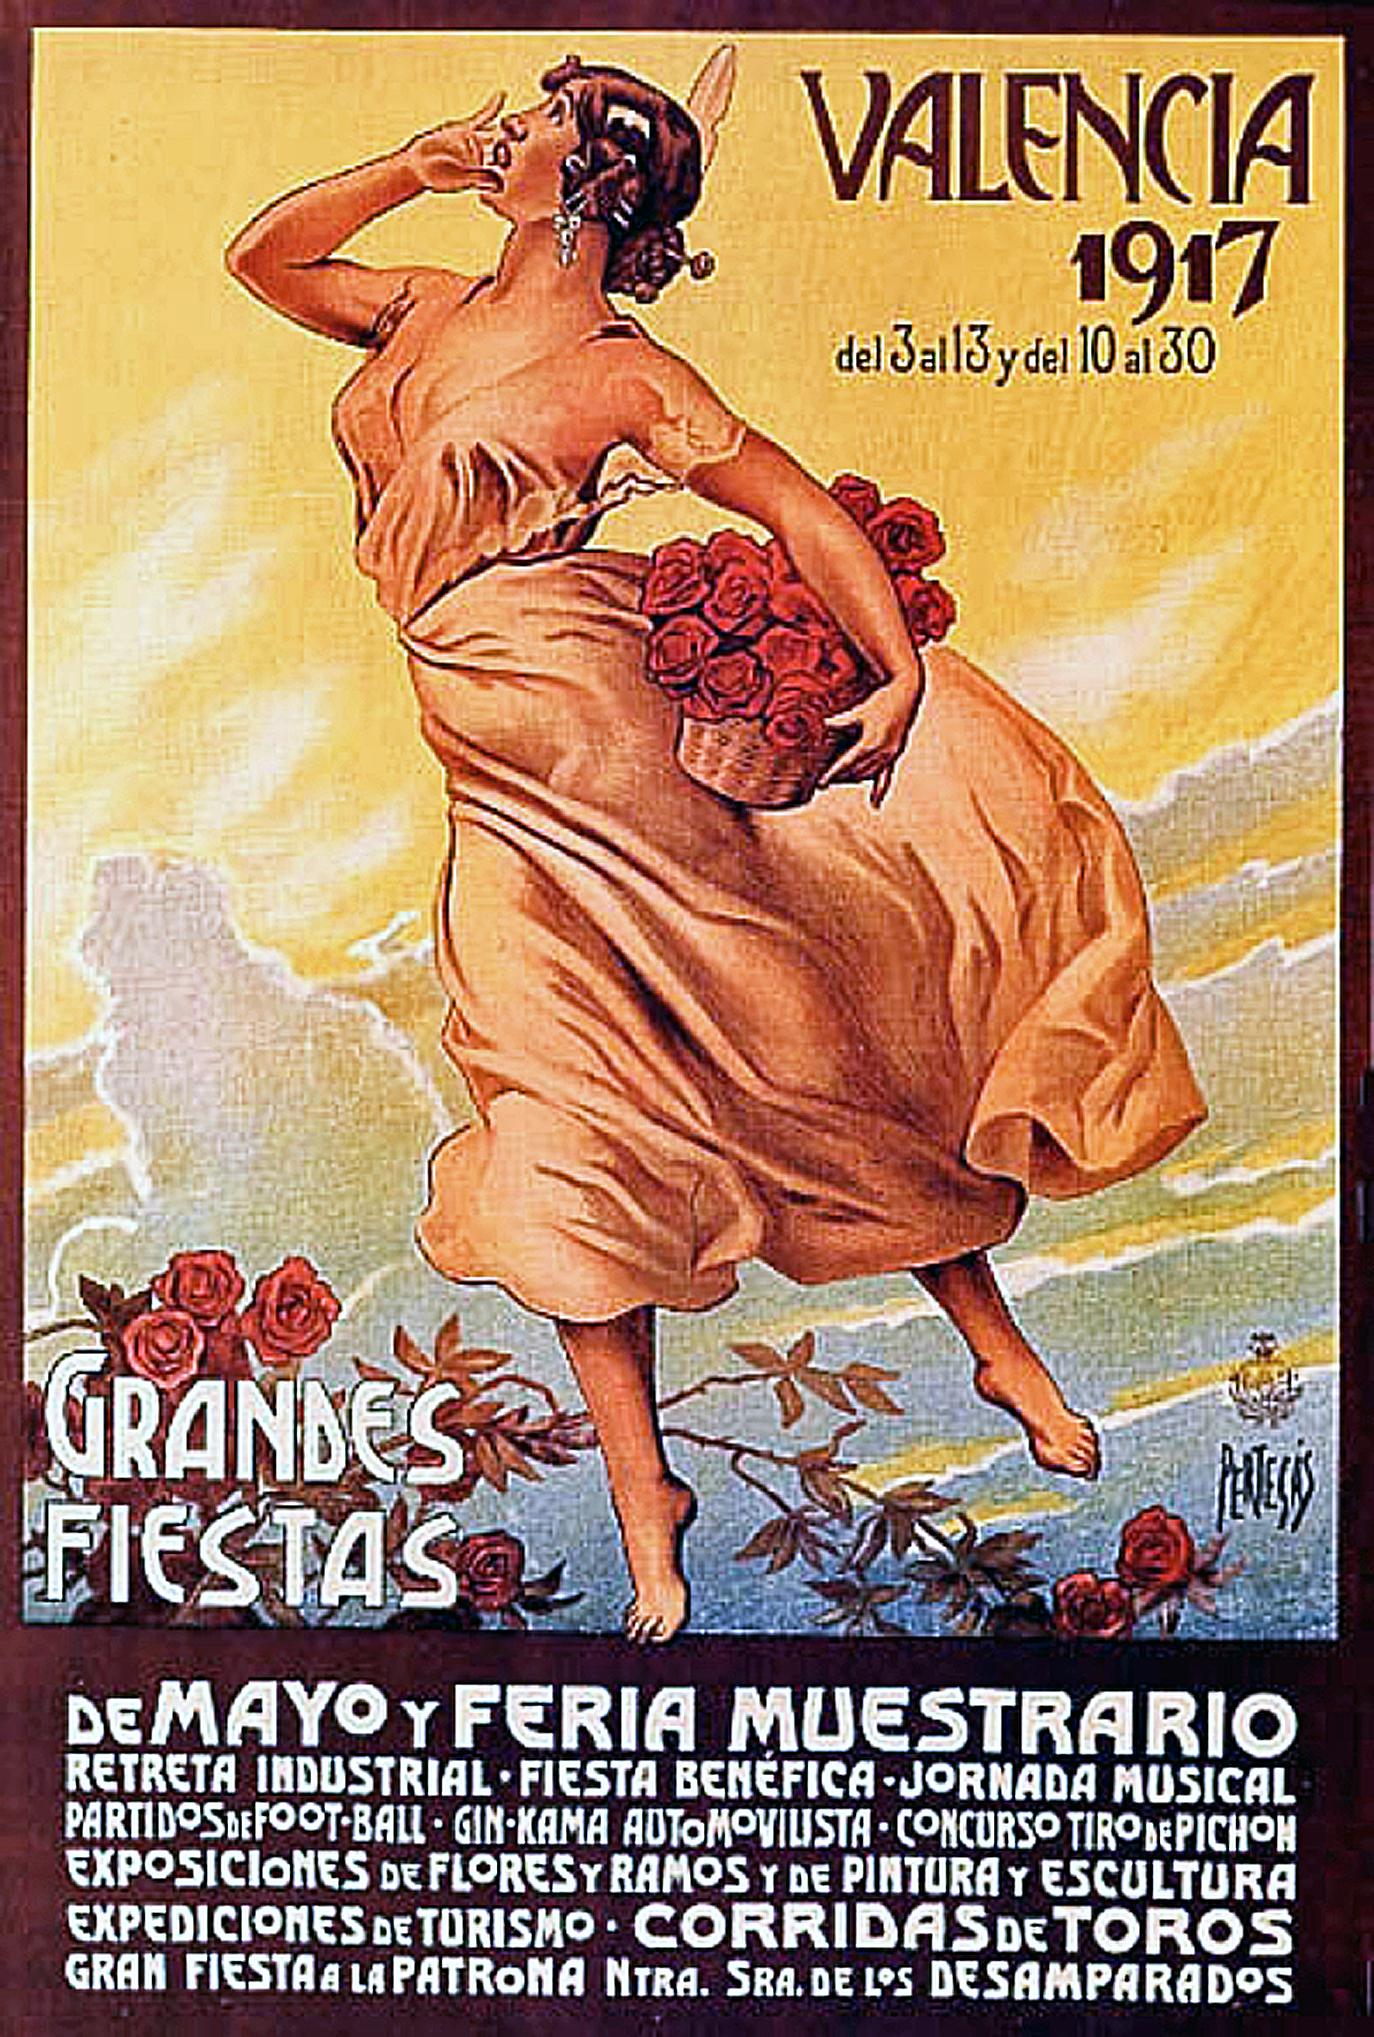 900 Travel Posters Spain España Portugal Ideas In 2021 Travel Posters Spain Vintage Travel Posters